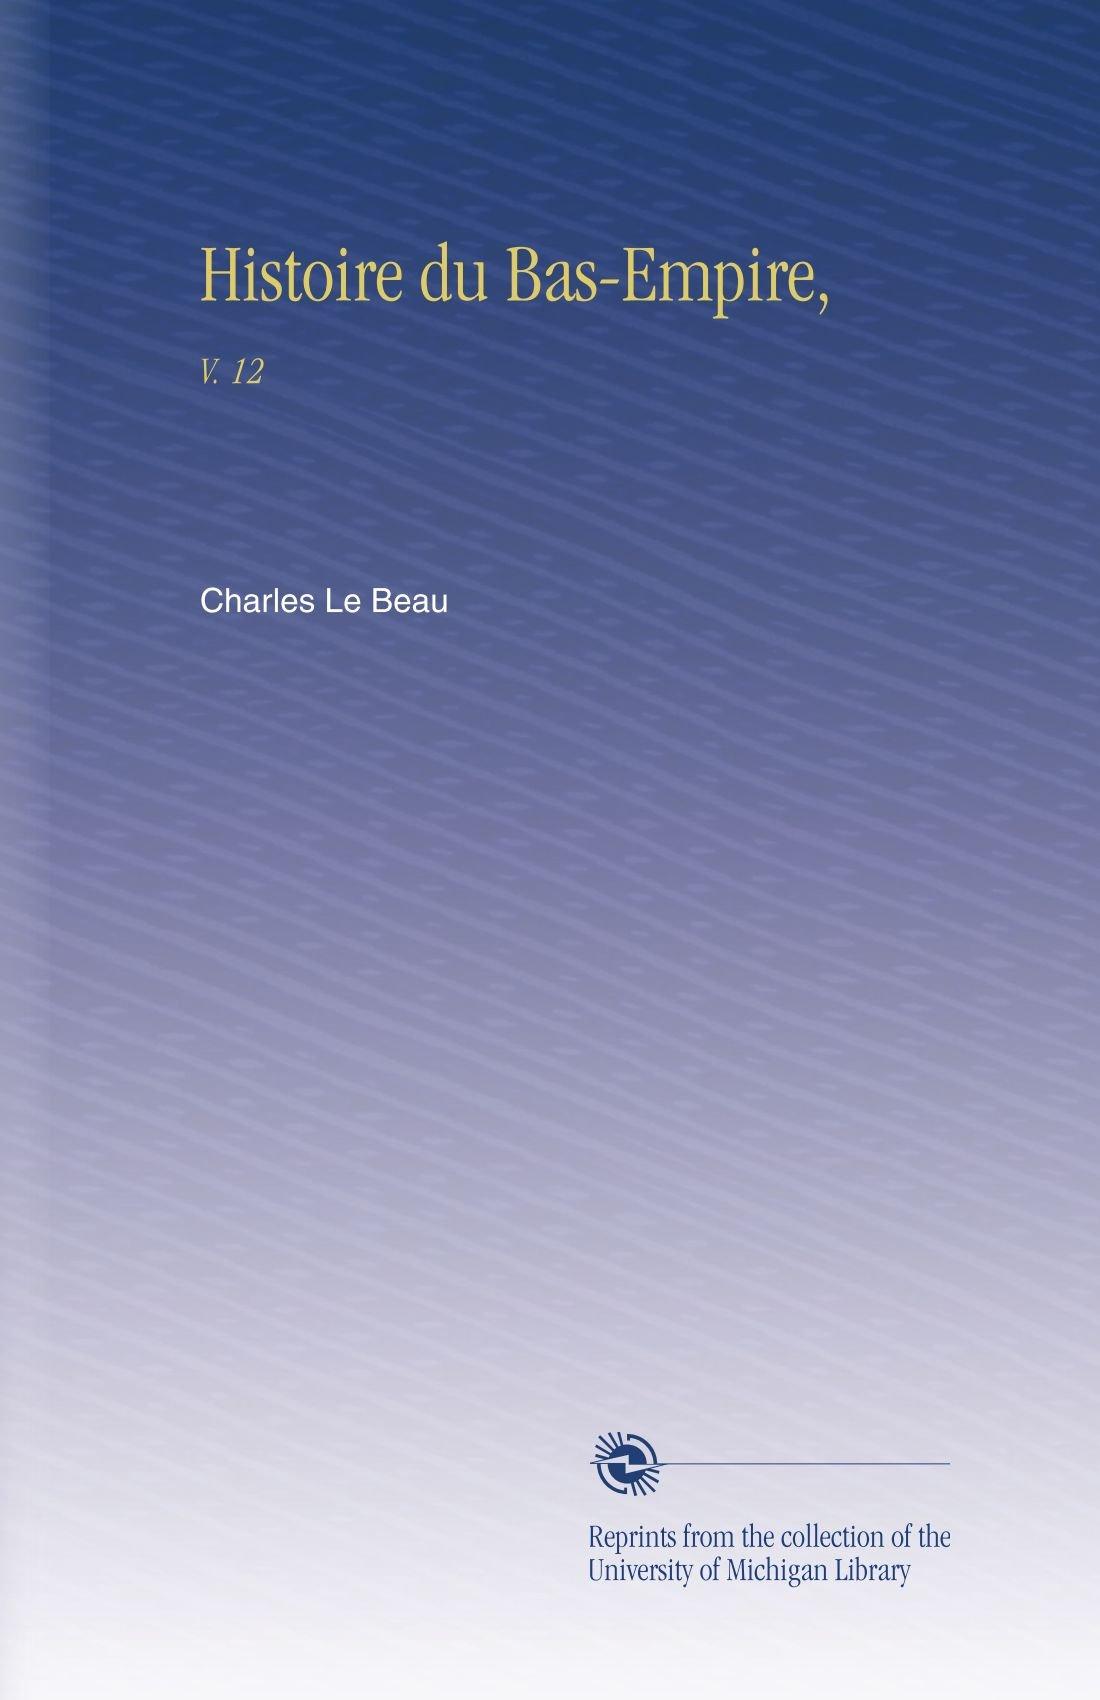 Histoire du Bas-Empire,: V. 12 (French Edition) ebook